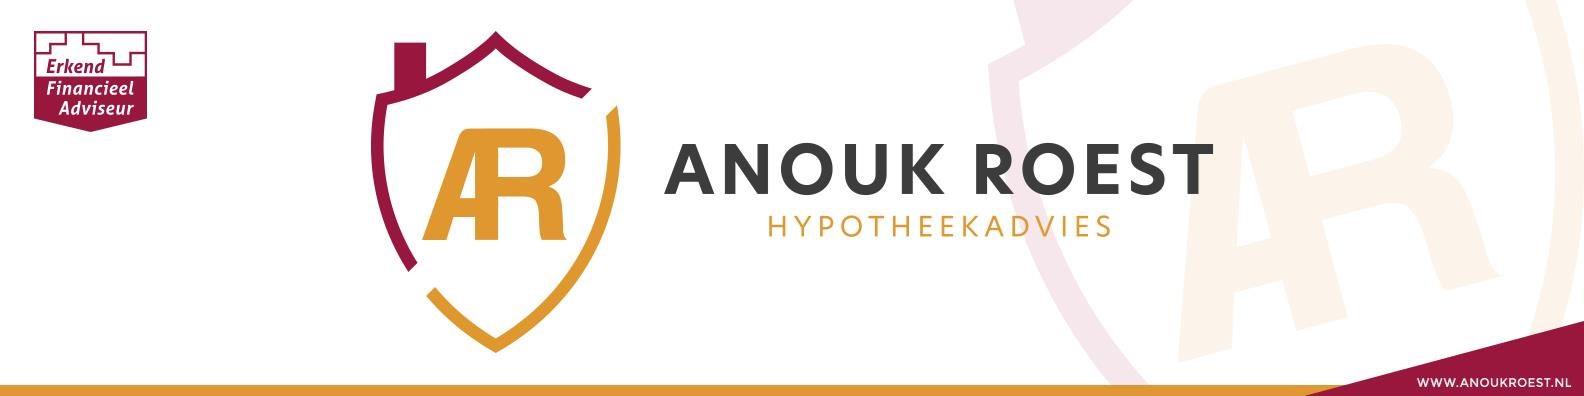 Logo van Anouk Roest Hypotheekadvies